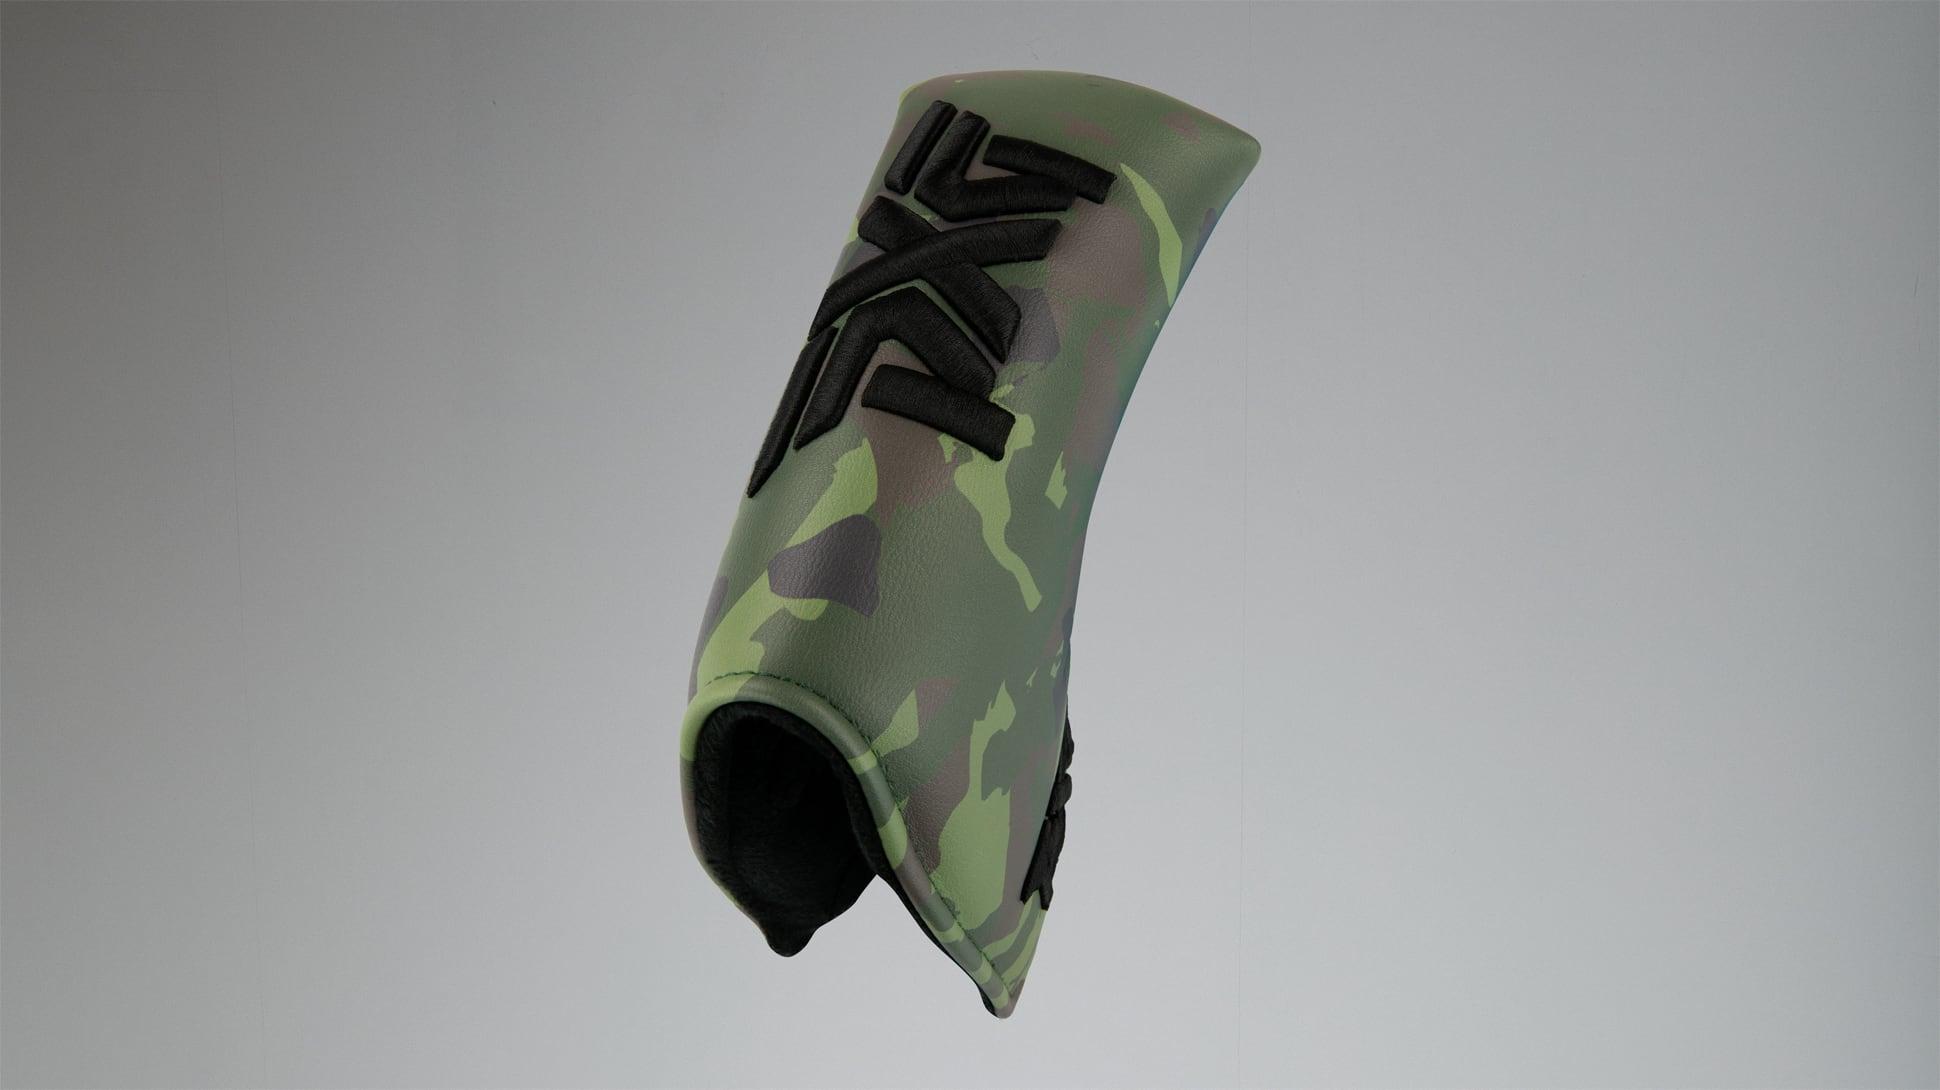 Jungle Camo Standard Blade Putter Headcover Image 3